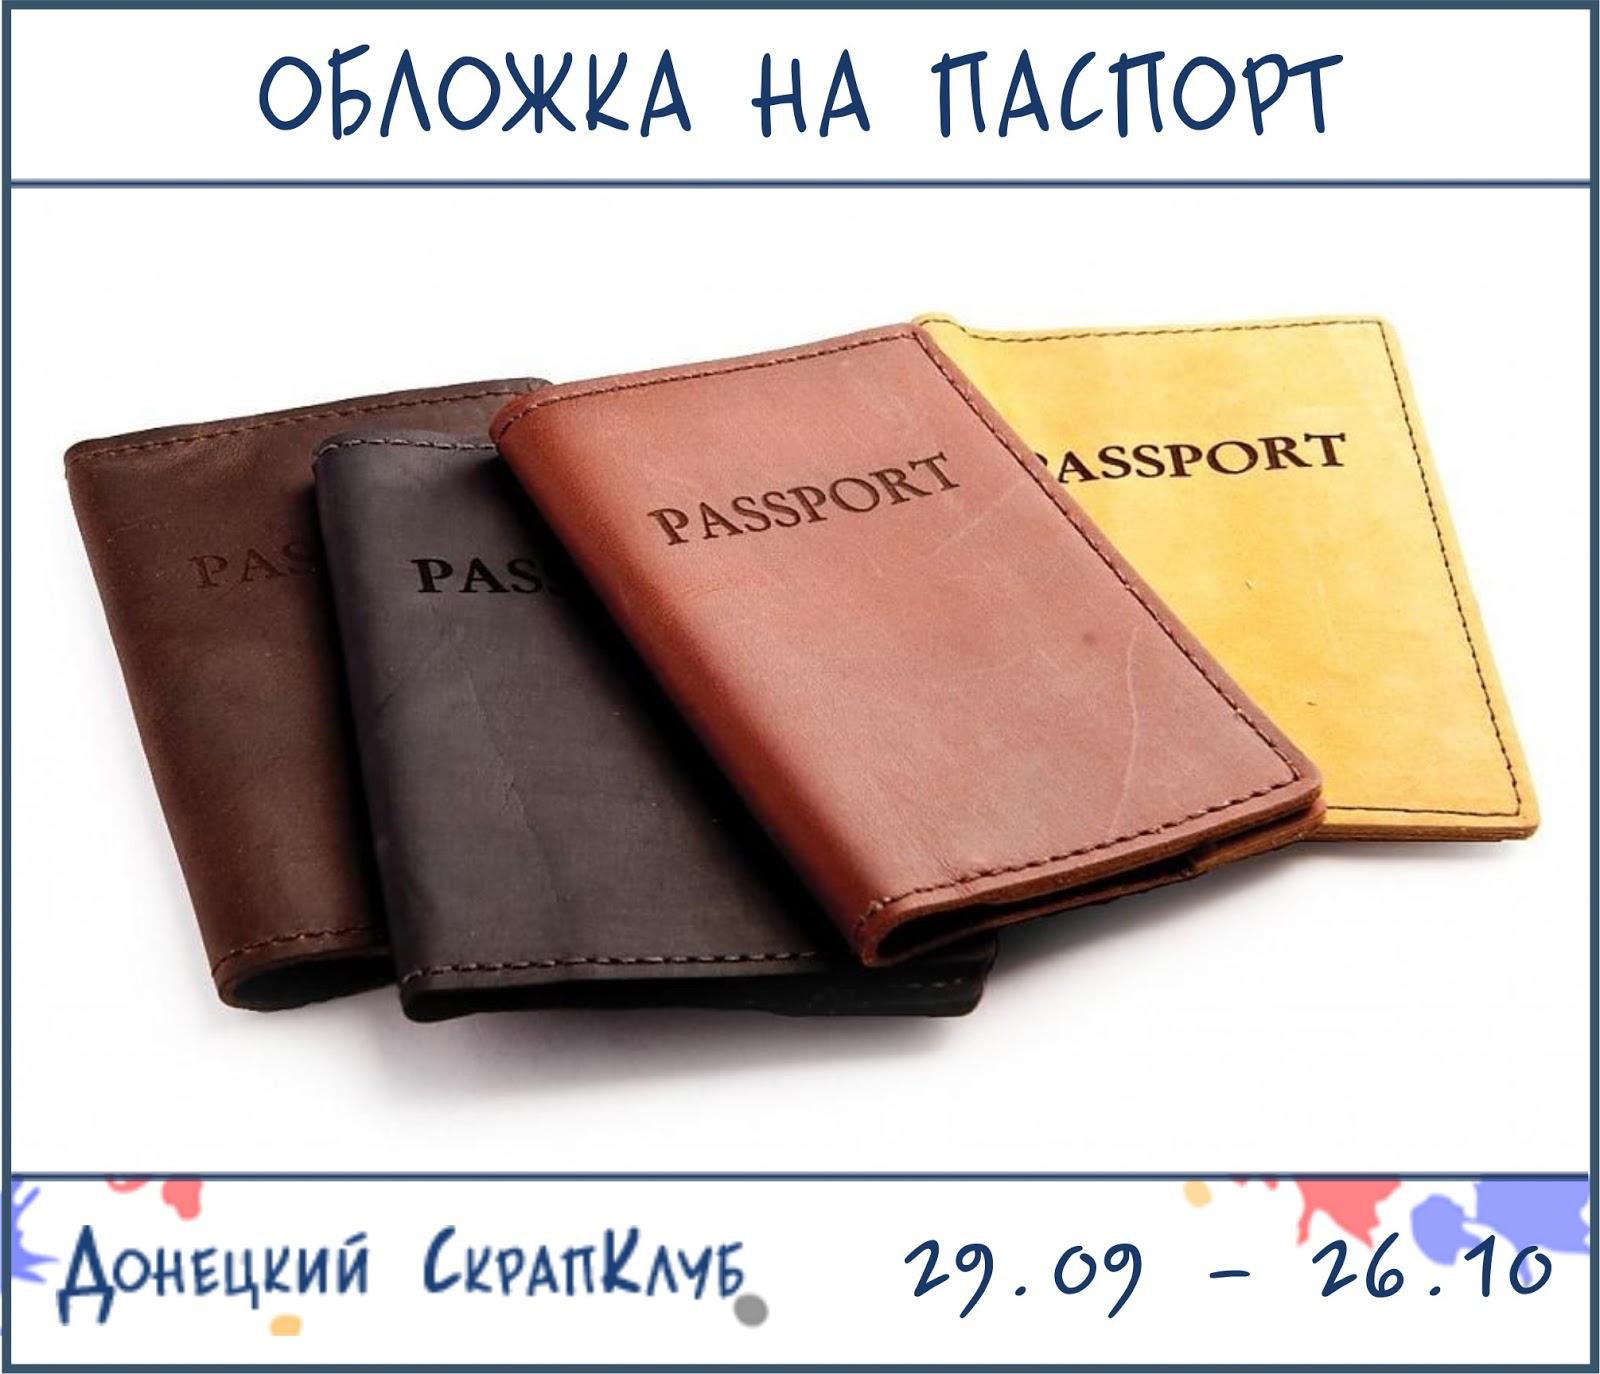 http://scrapclub-donetsk.blogspot.ru/2014/09/blog-post_29.html